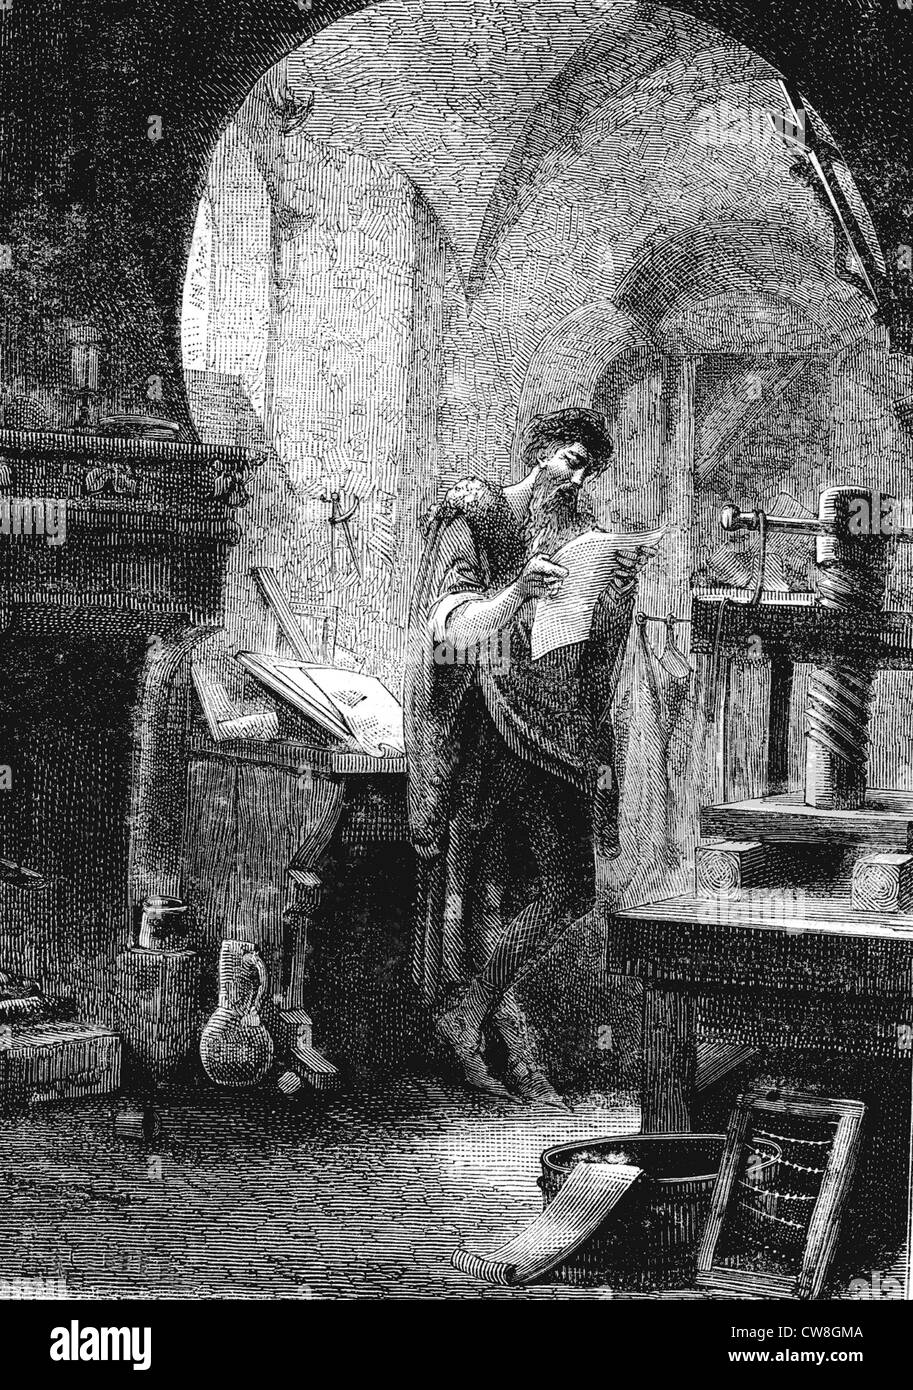 Johannes Gutenberg High Resolution Stock Photography and ...